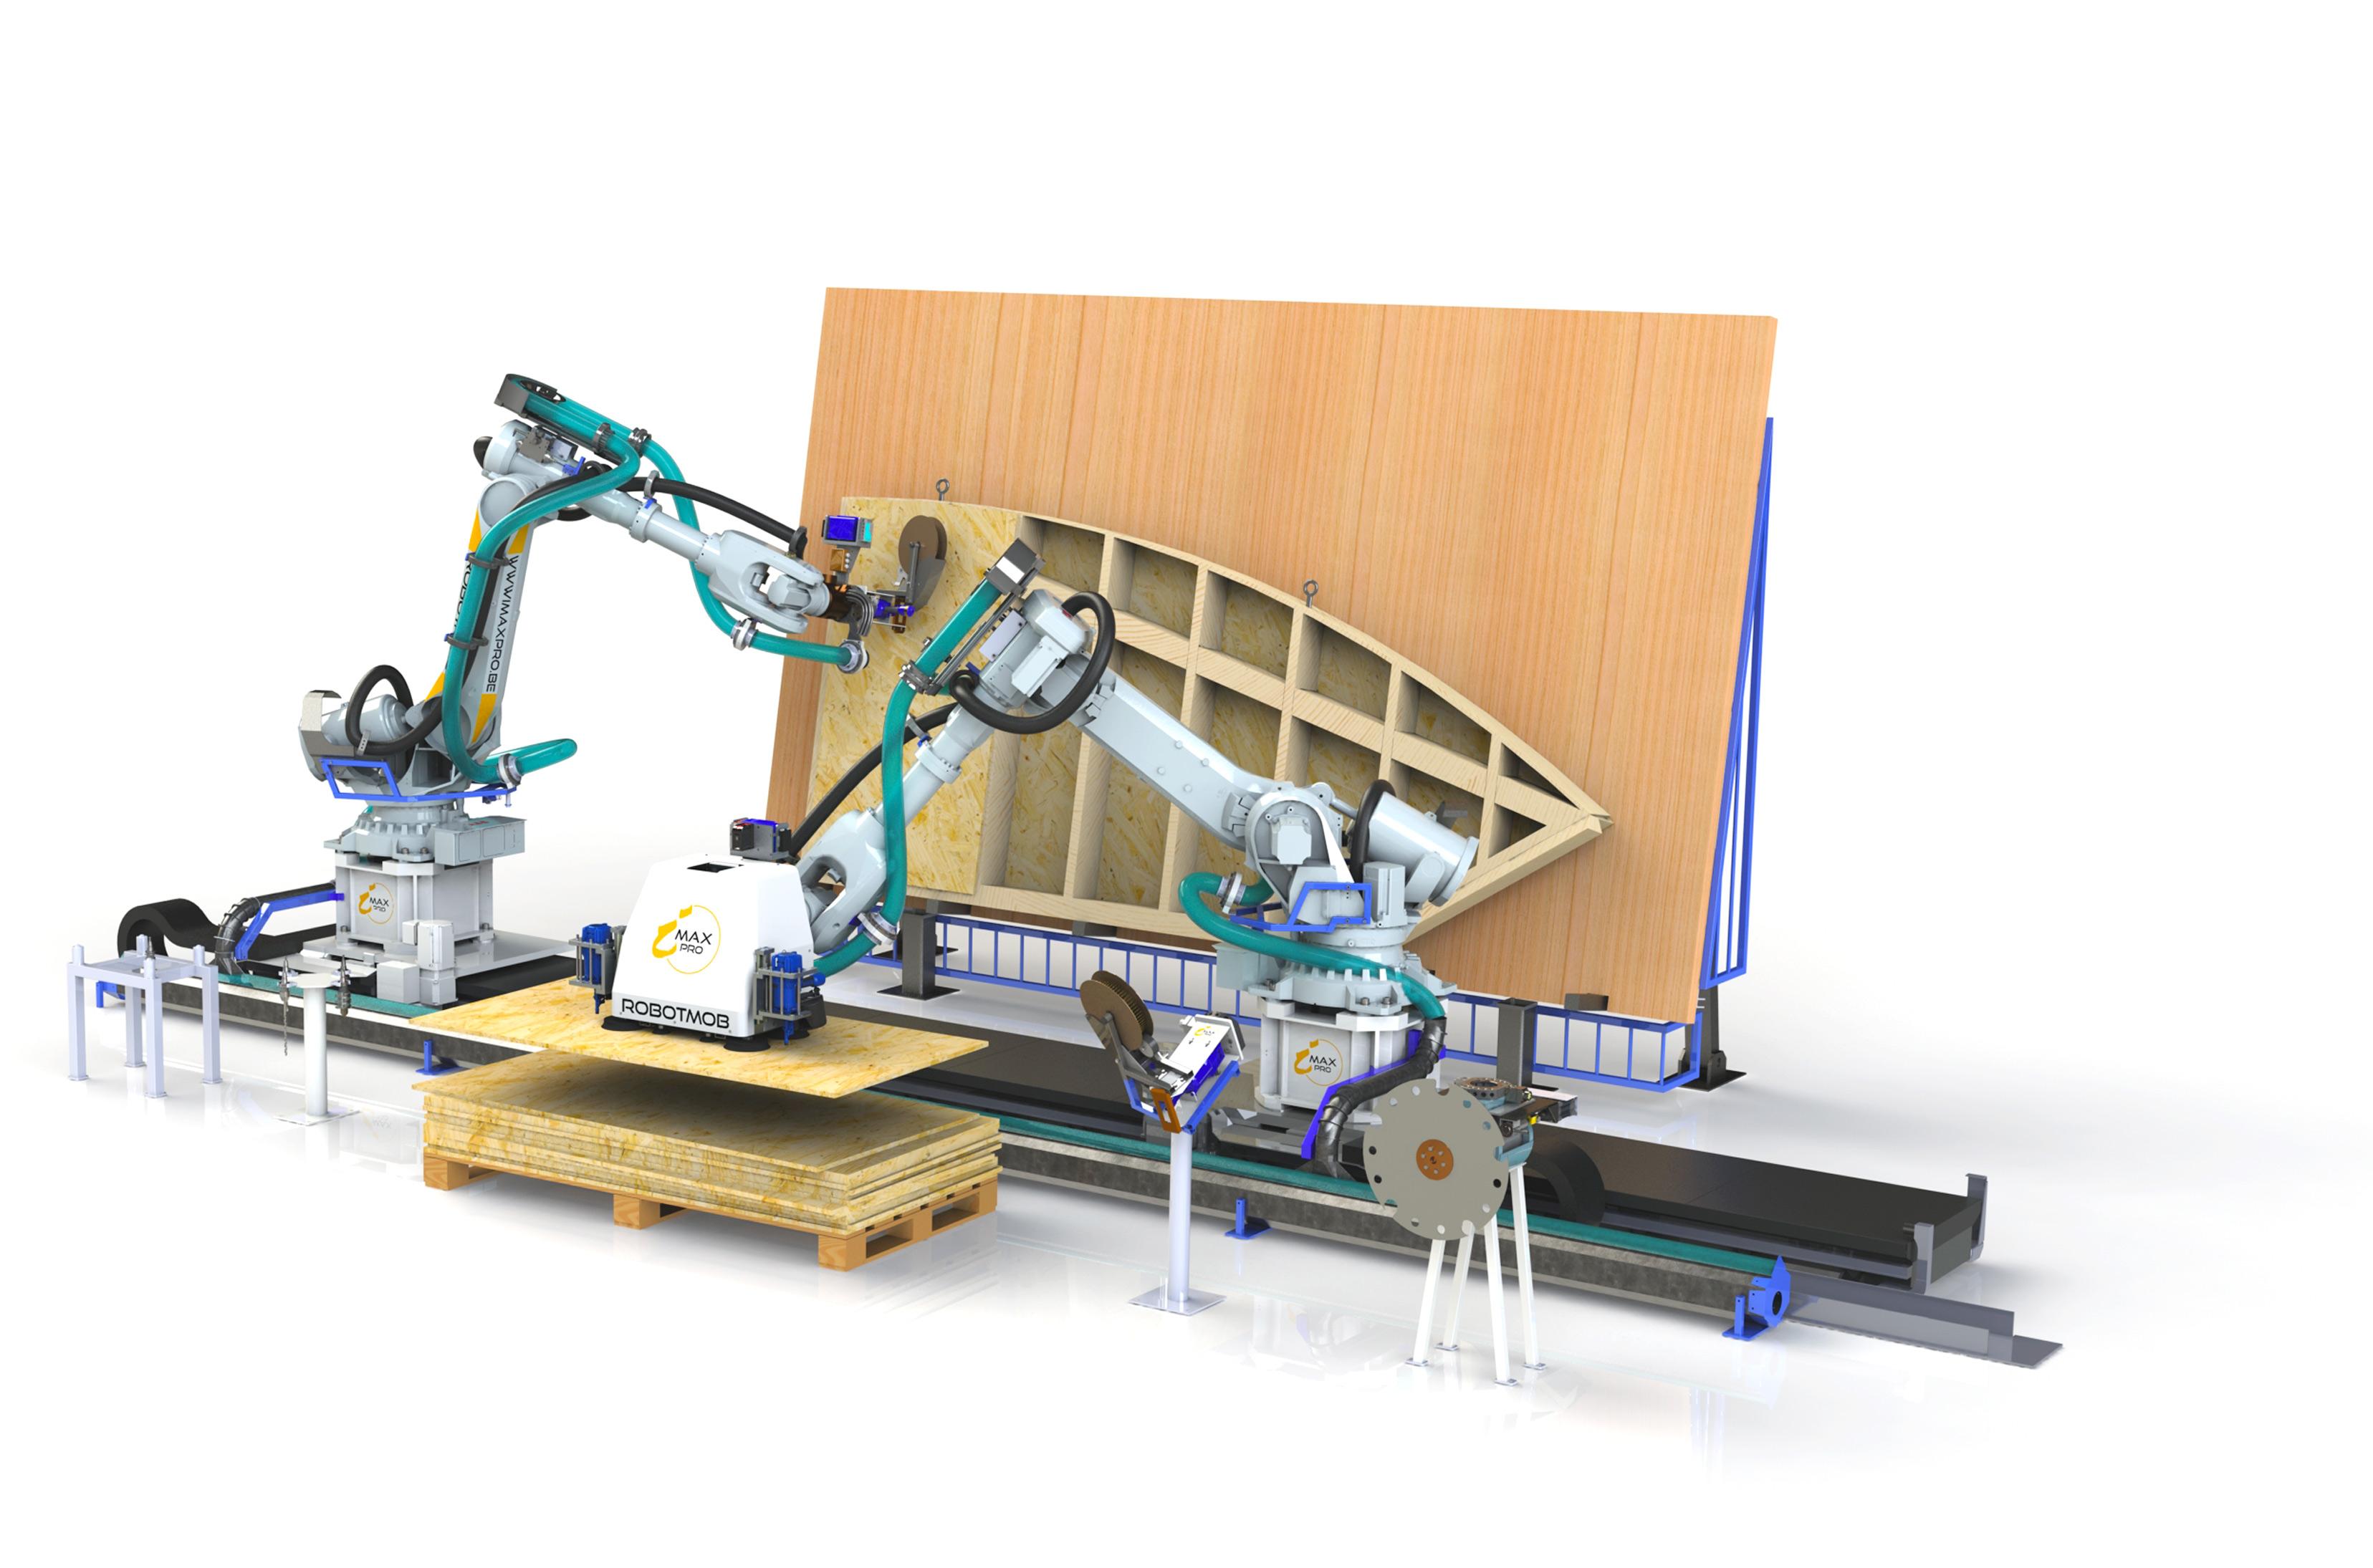 Collaborative Robot - robots